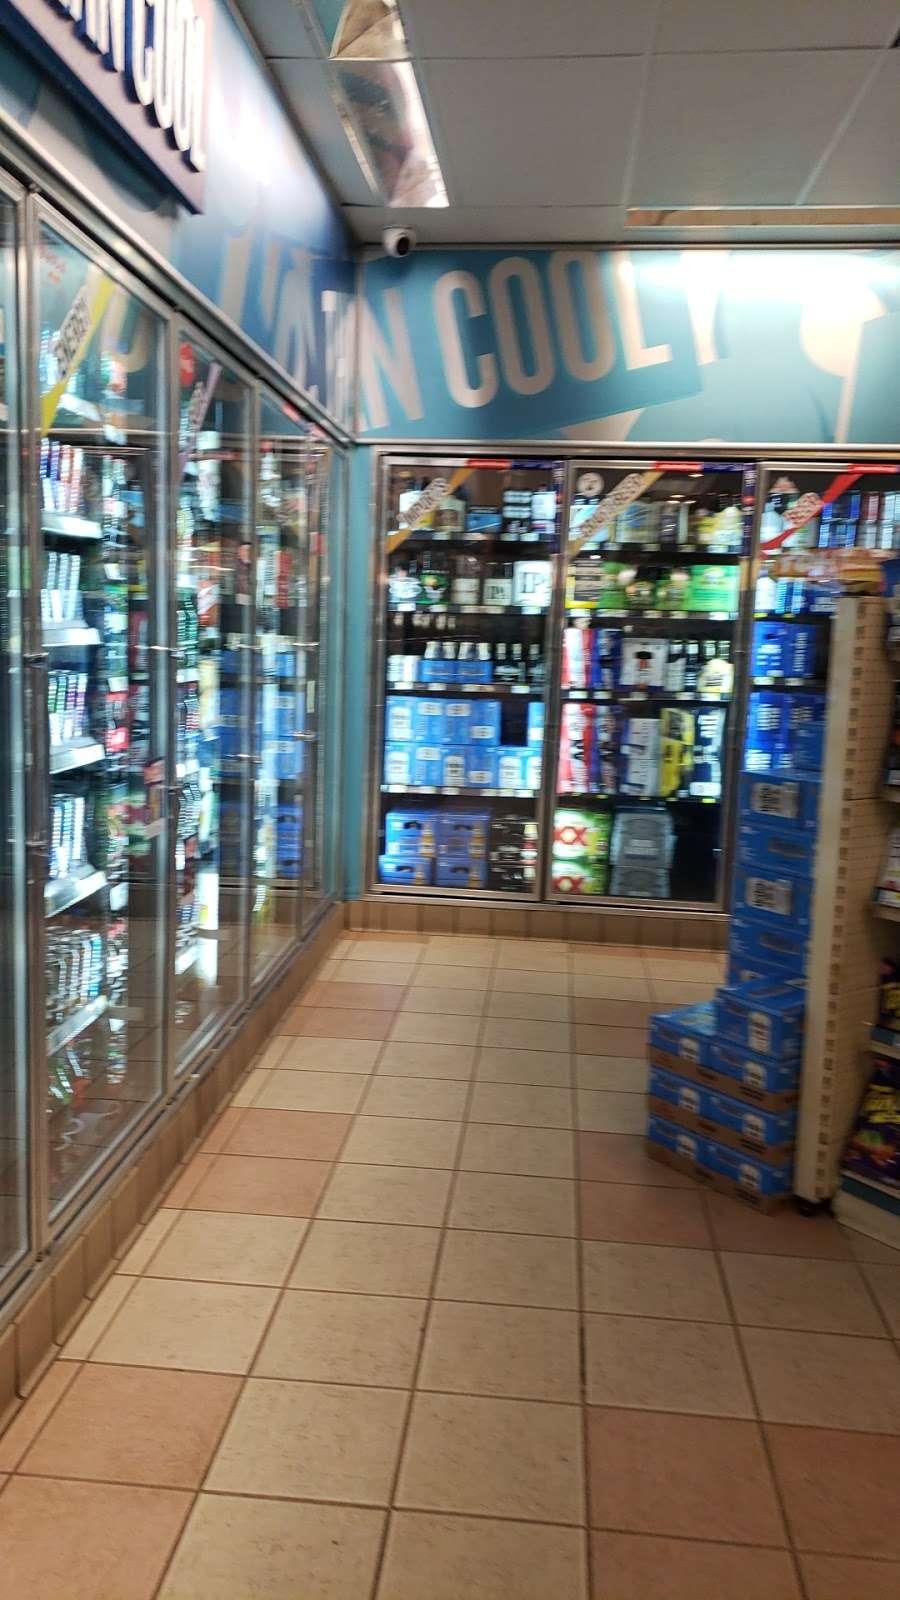 ampm - convenience store    Photo 7 of 10   Address: 15531 San Pablo Ave, Richmond, CA 94806, USA   Phone: (510) 243-0773